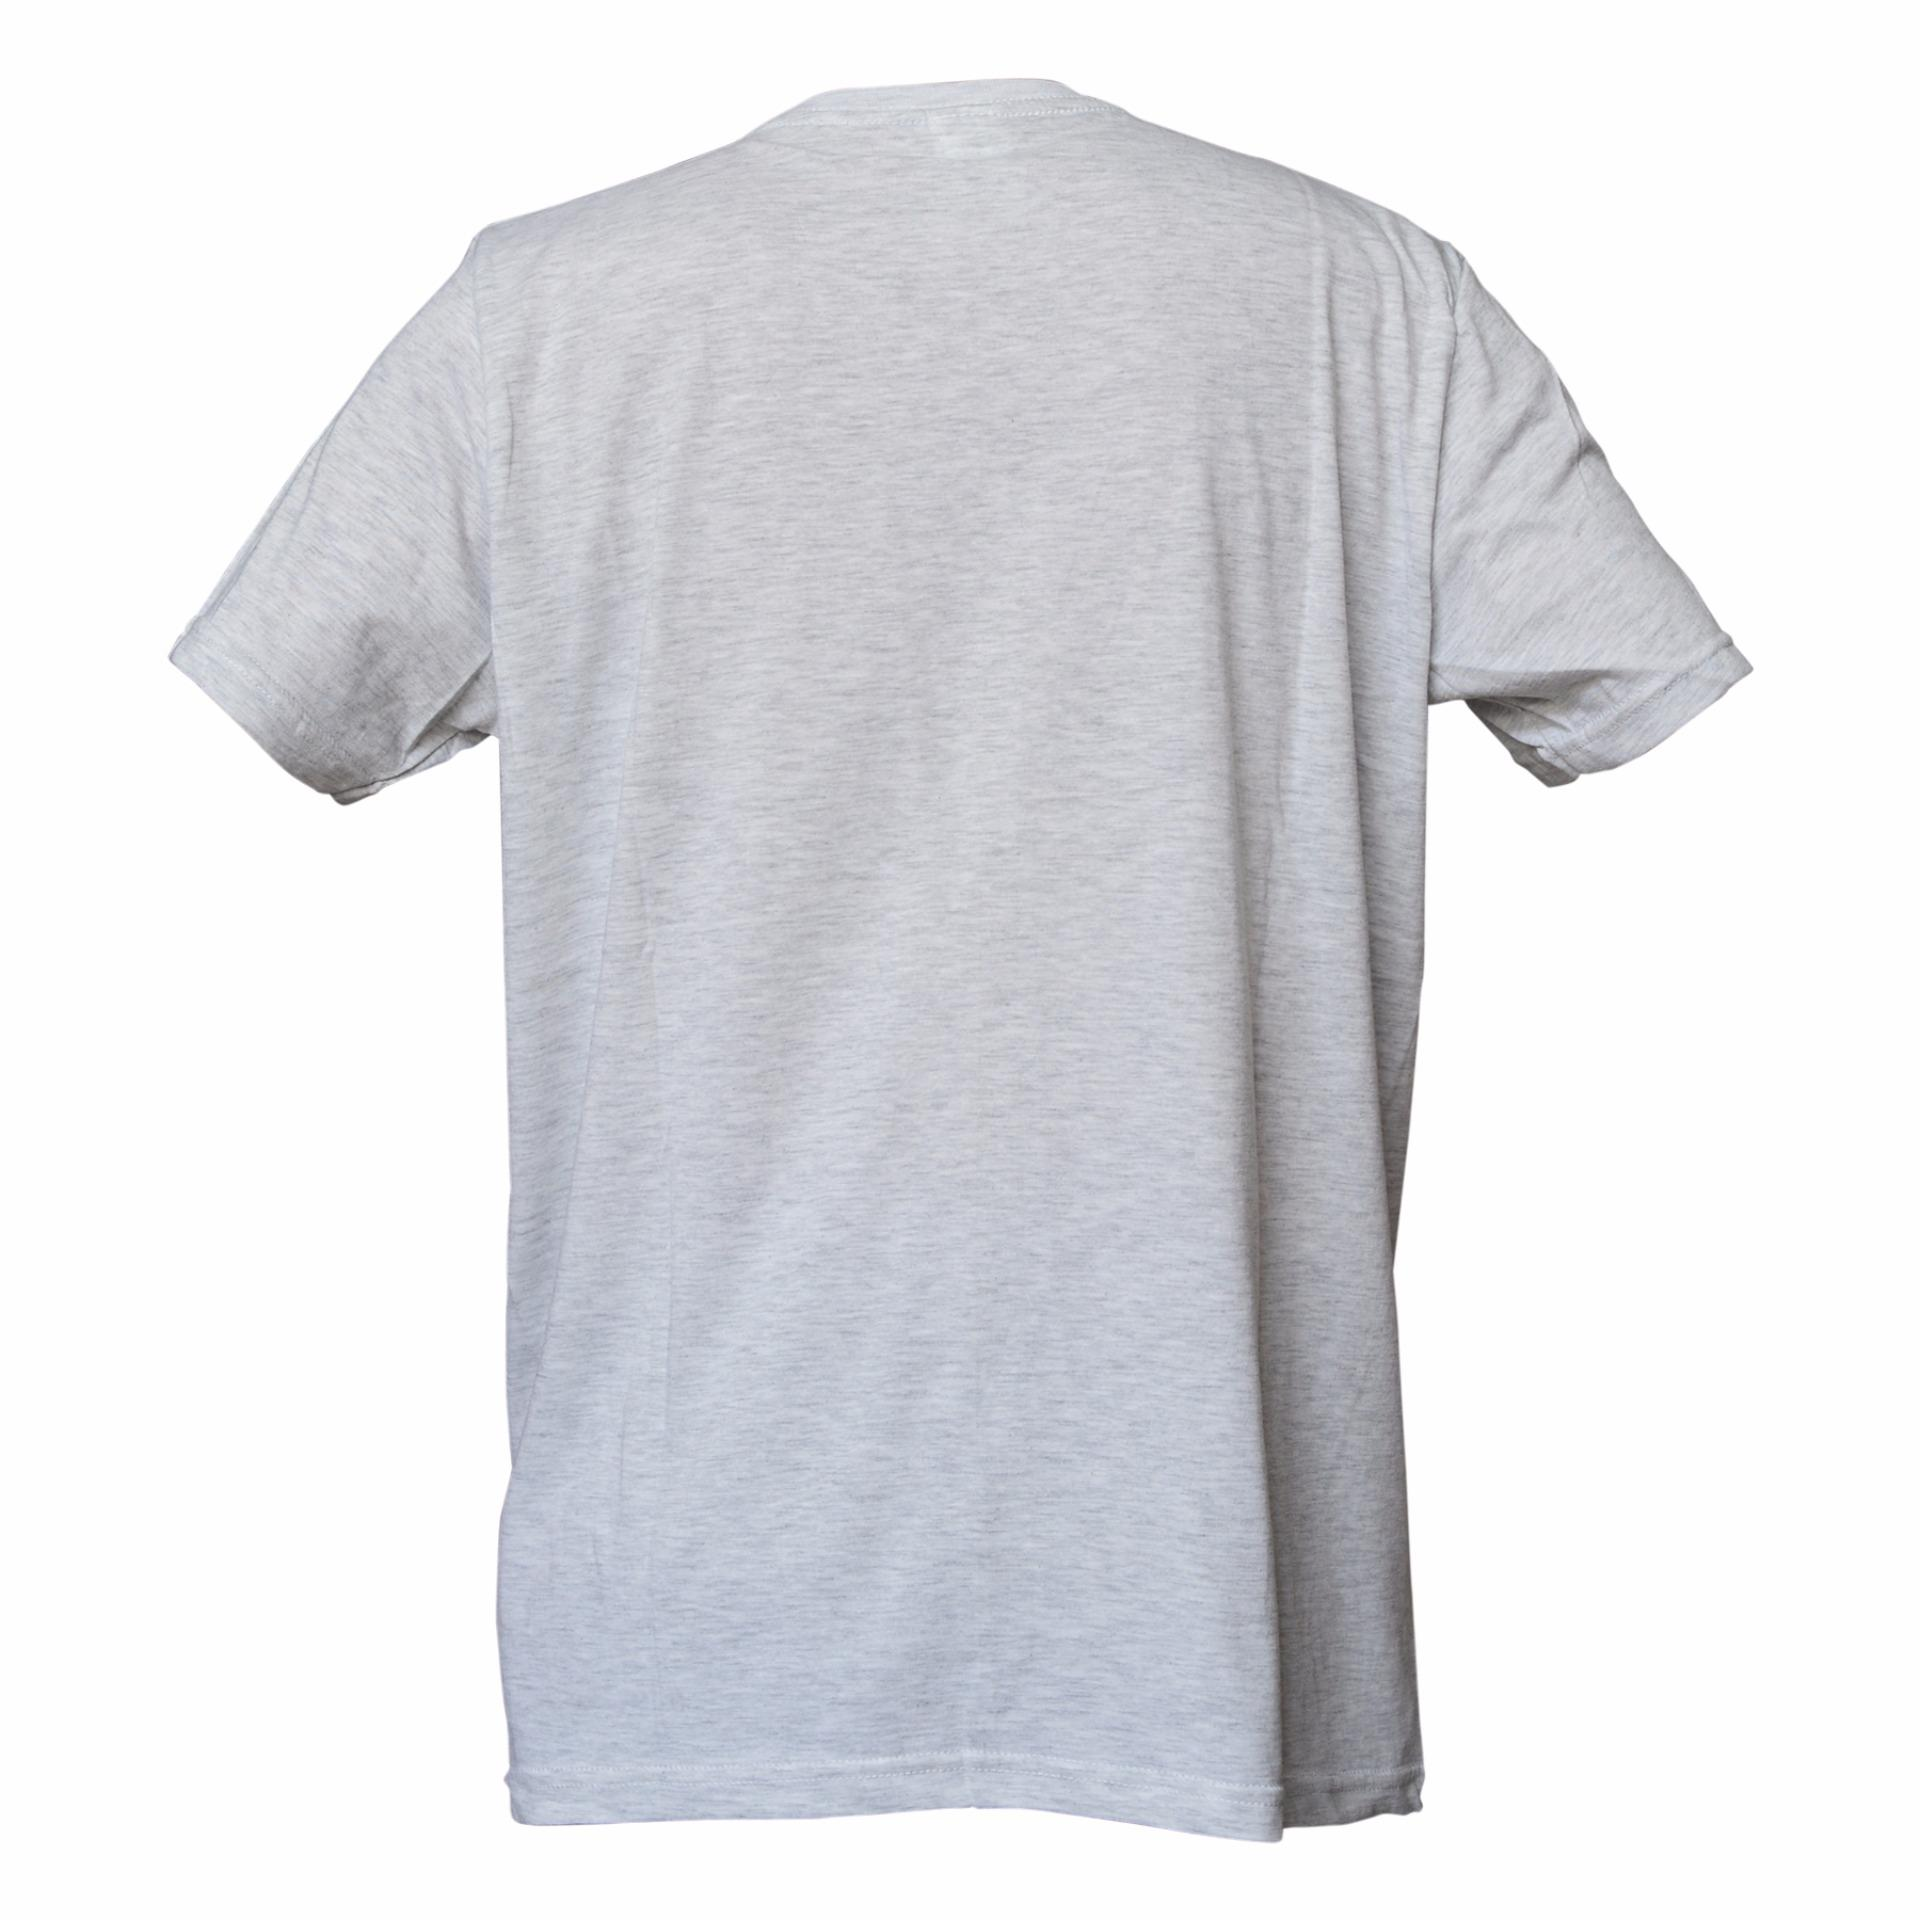 Muscle Fit Kaos Polos T-shirt V-neck Lengan Pendek Cotton .